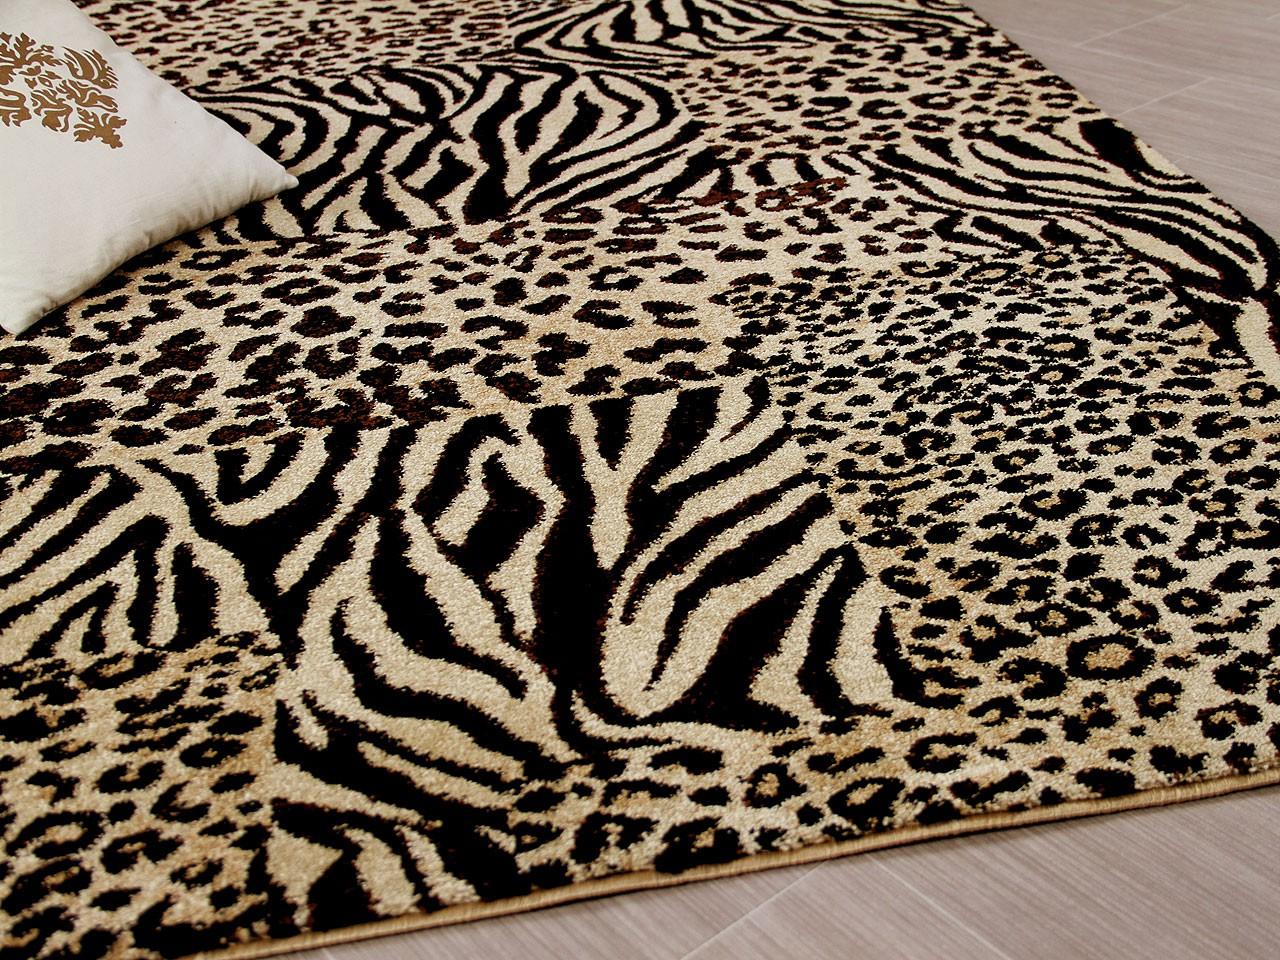 Designer Teppich Suite Leopard Zebra Beige Teppiche